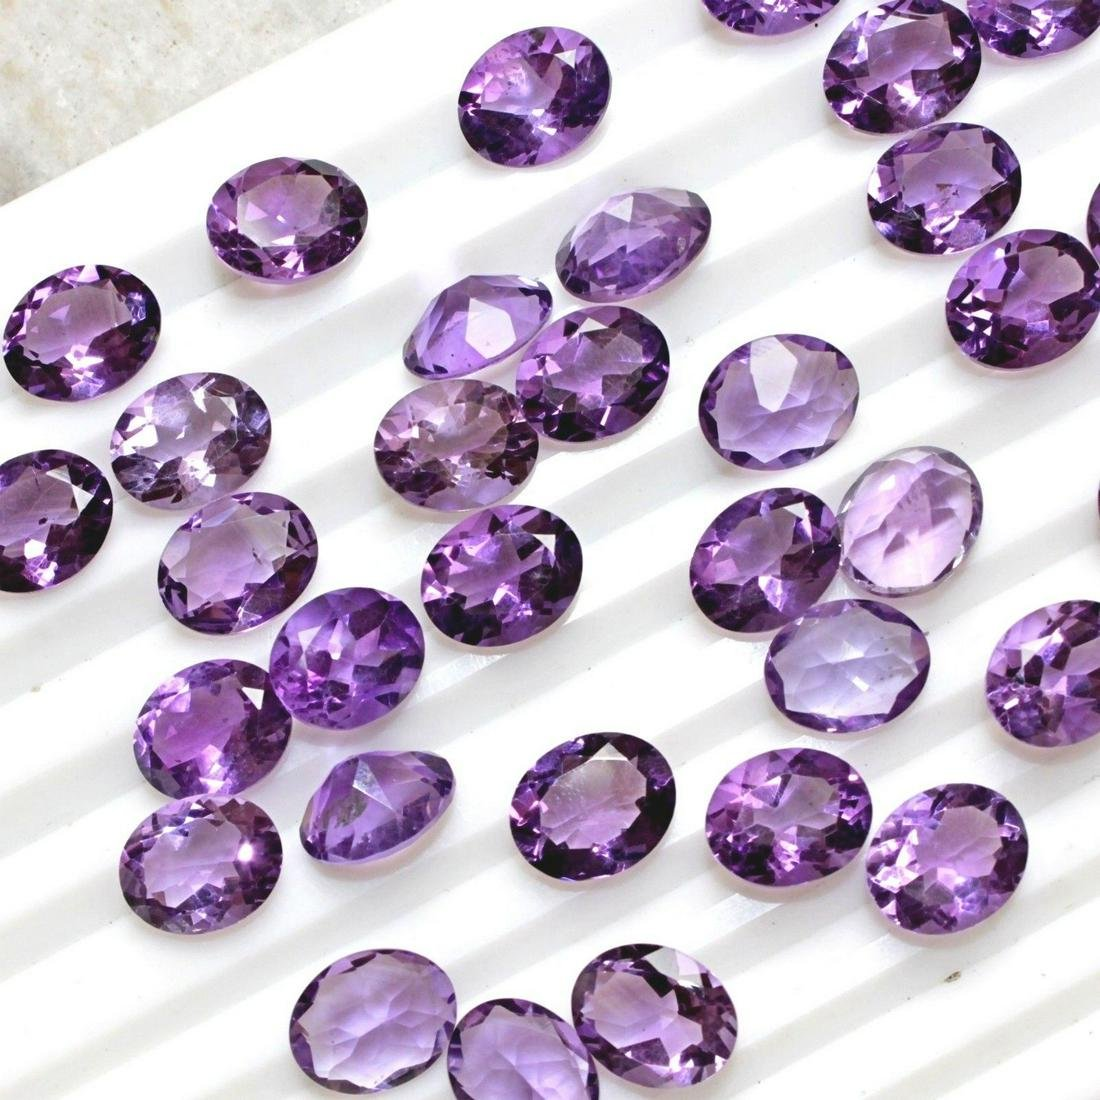 Natural Purple Amethyst 9x11 MM Oval Cut Loose Gemstone